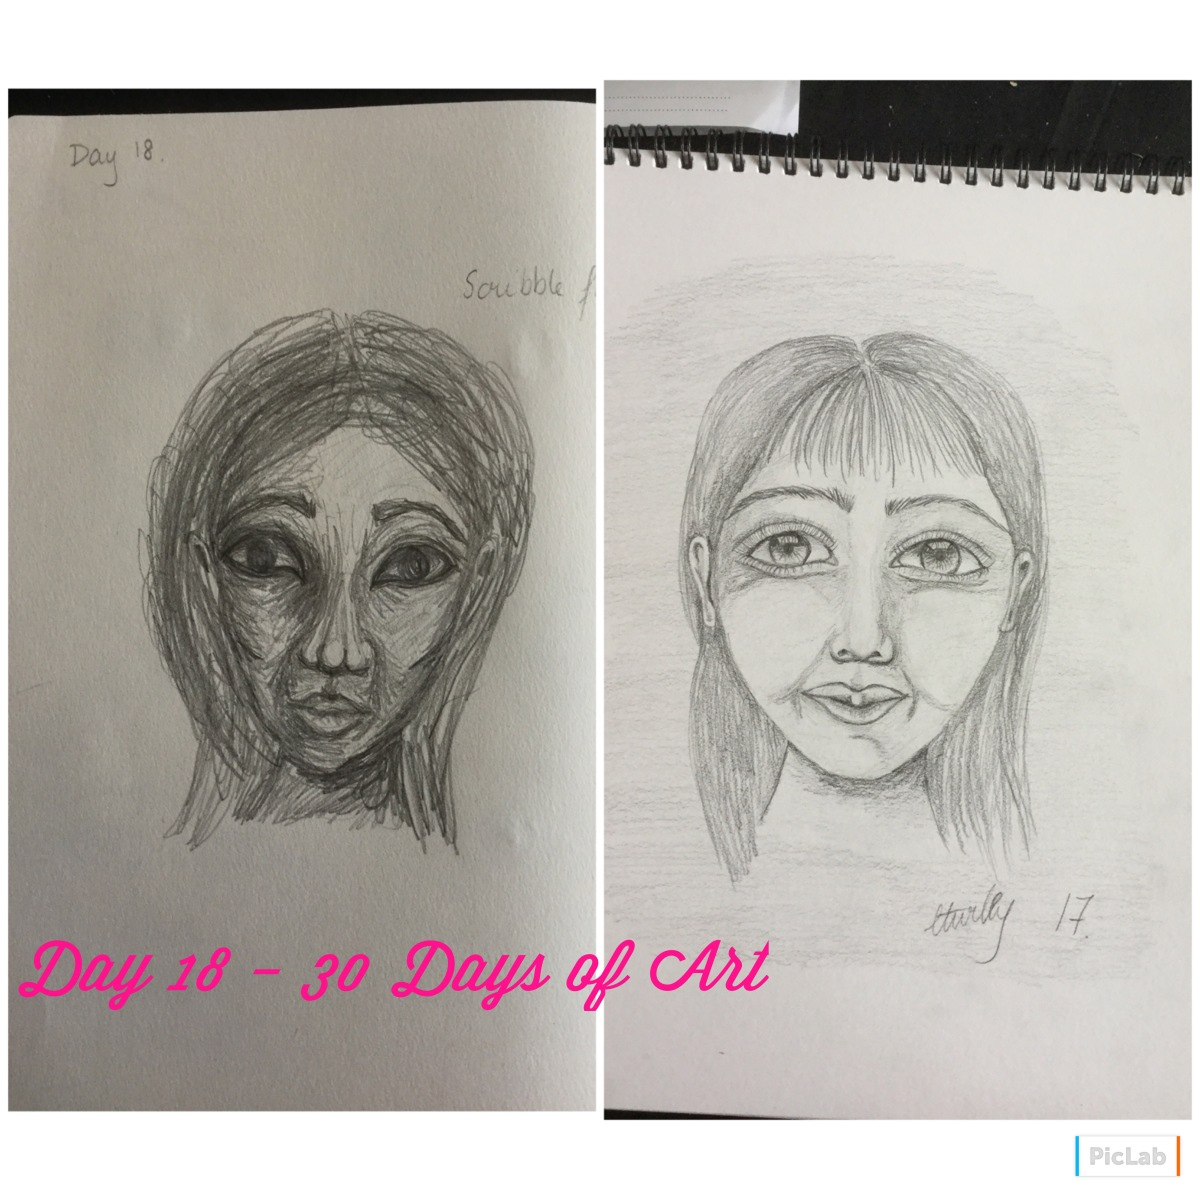 Day 18 – 30 Days ofArt